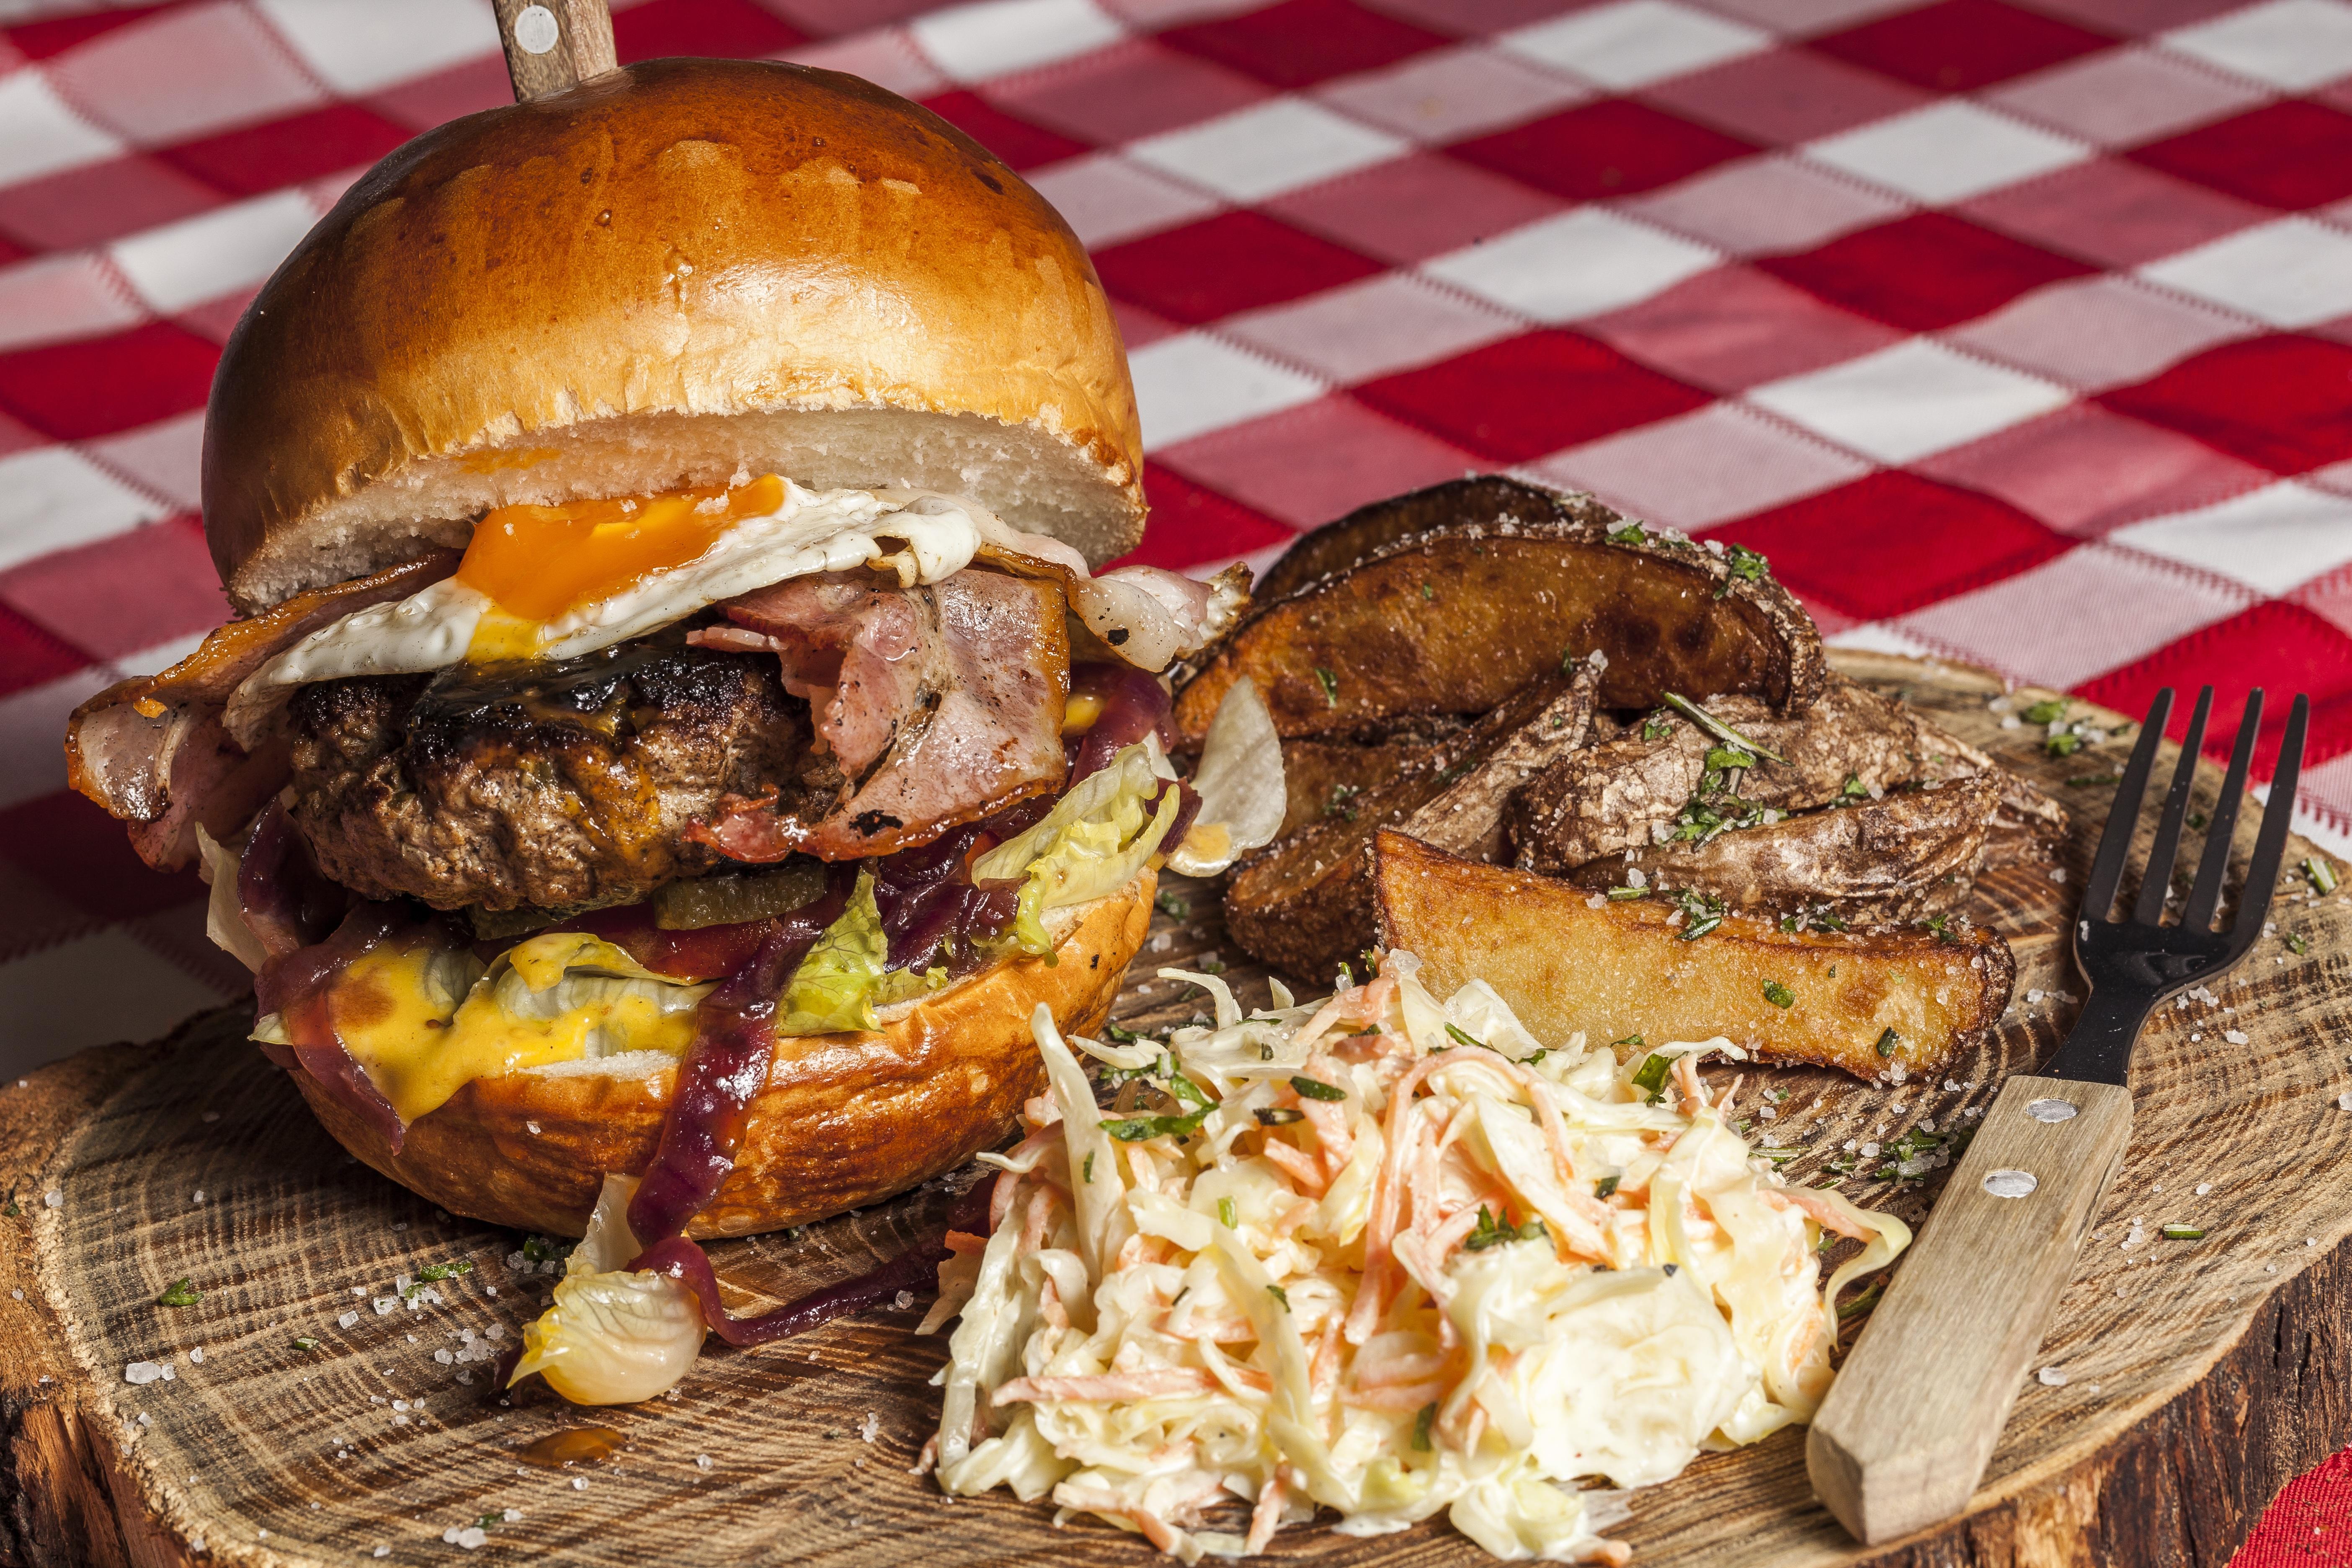 151444 Заставки и Обои Овощи на телефон. Скачать Мясо, Еда, Овощи, Бургер, Гамбургер картинки бесплатно